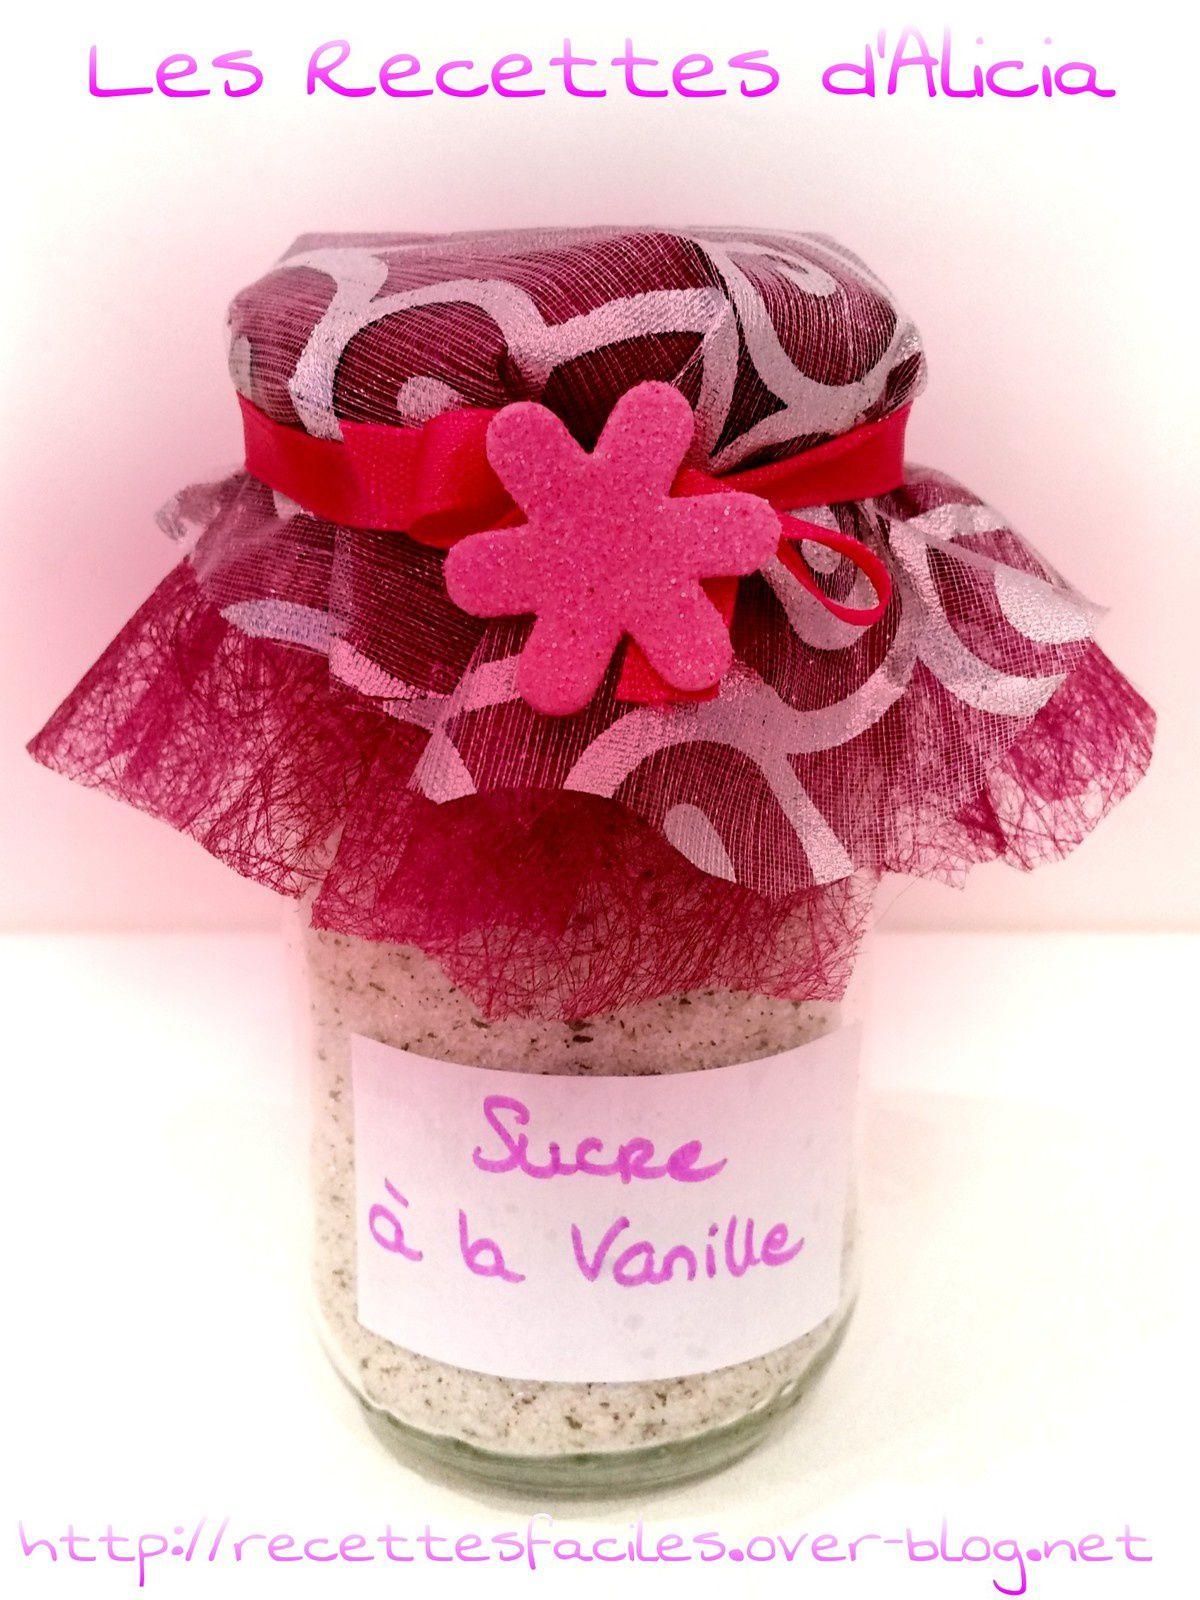 Sucre aromatisé vanille